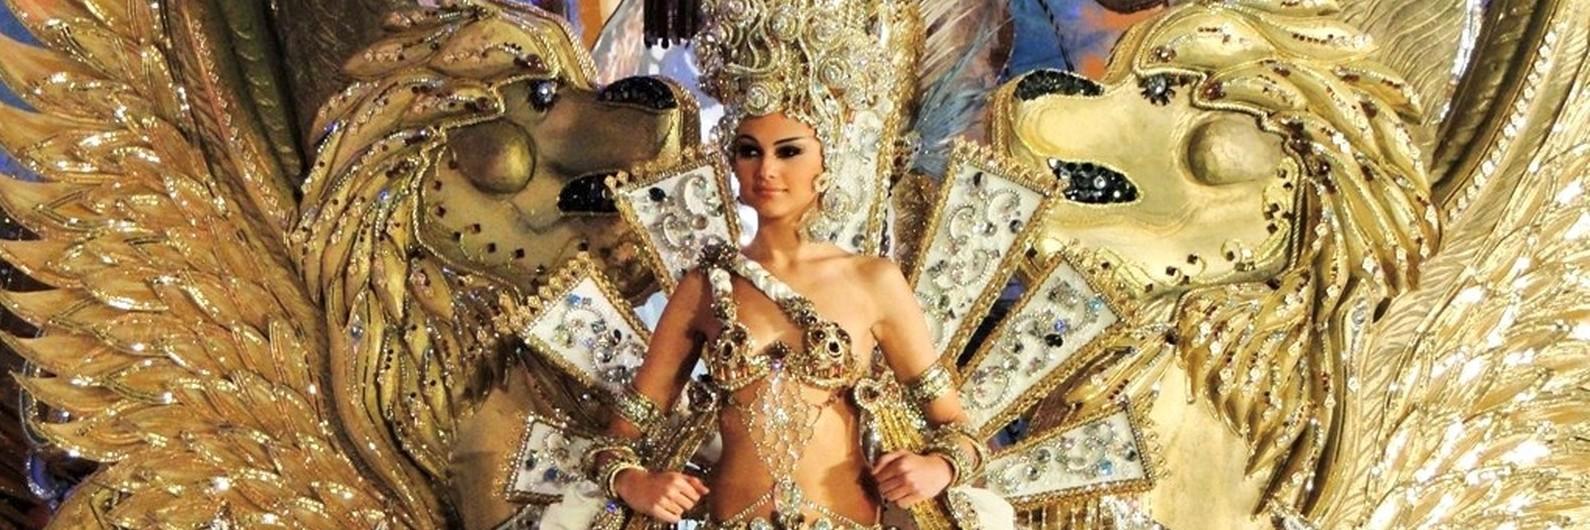 Tenerife: a ilha da eterna primavera onde o Carnaval é rei